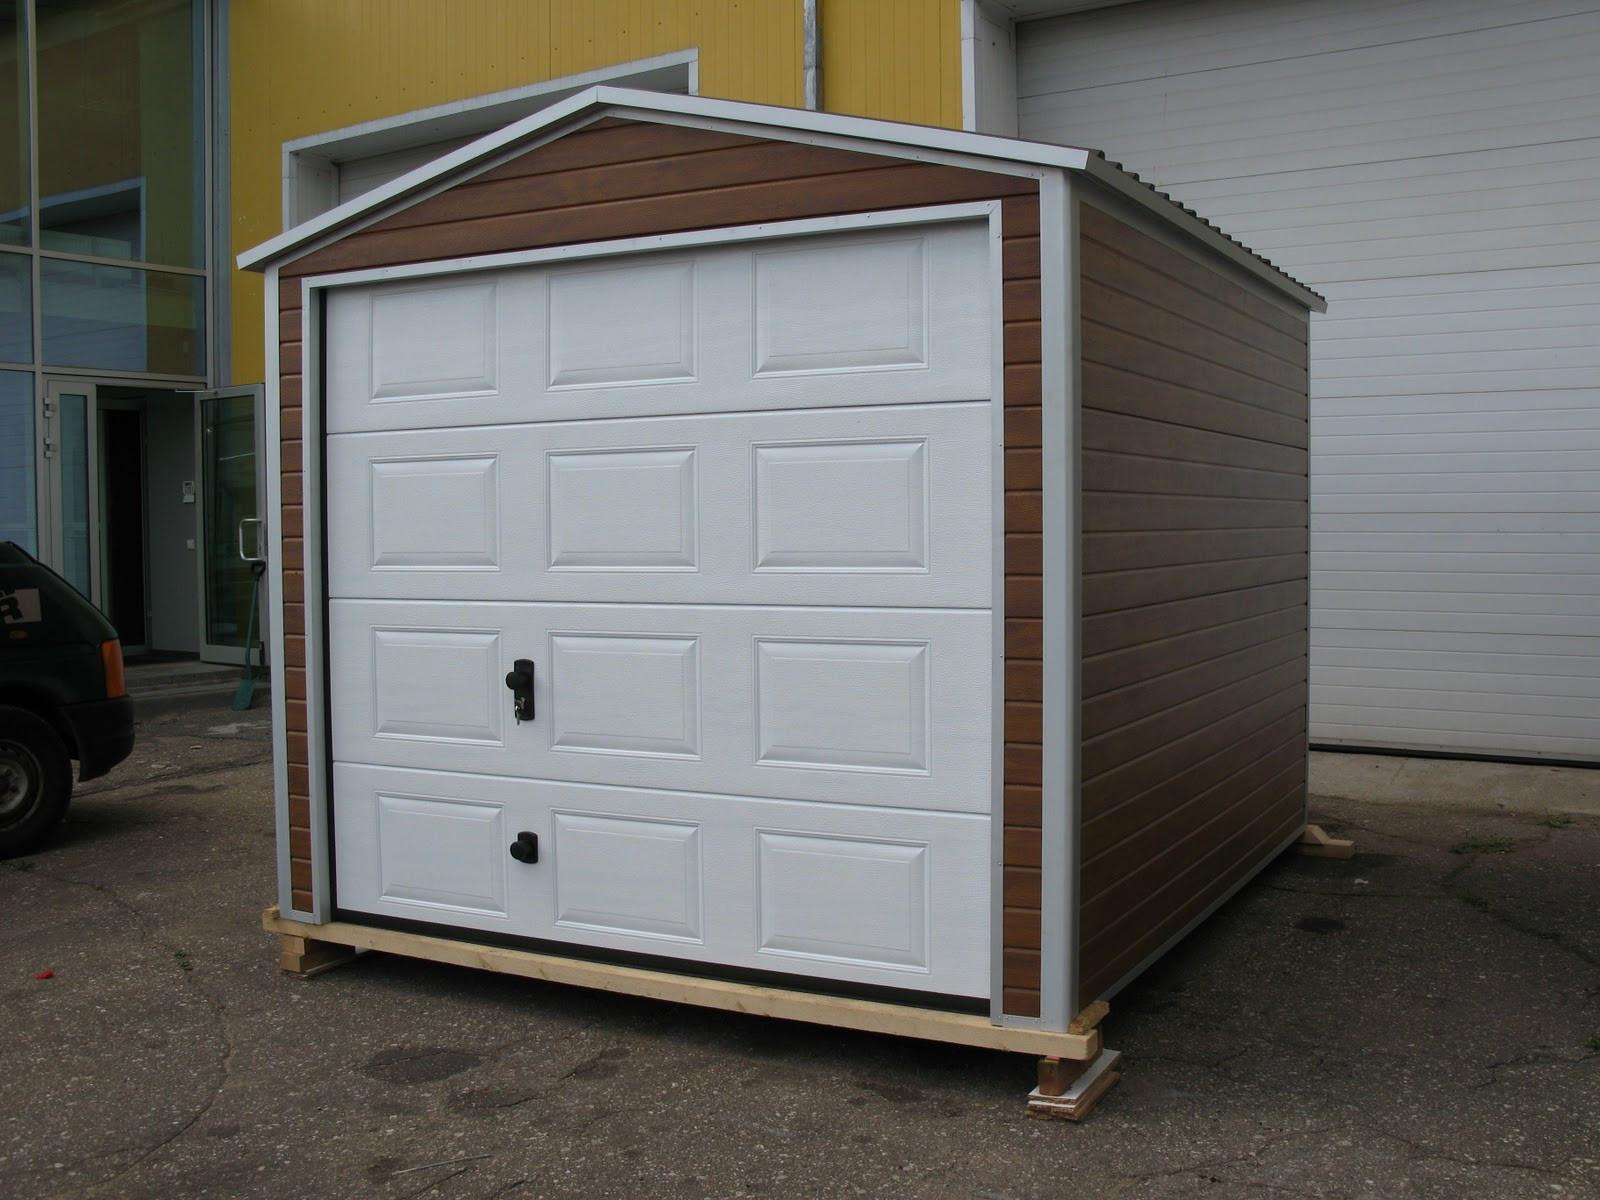 Best ideas about DIY Garage Door . Save or Pin DIY garage or garden shed Now.